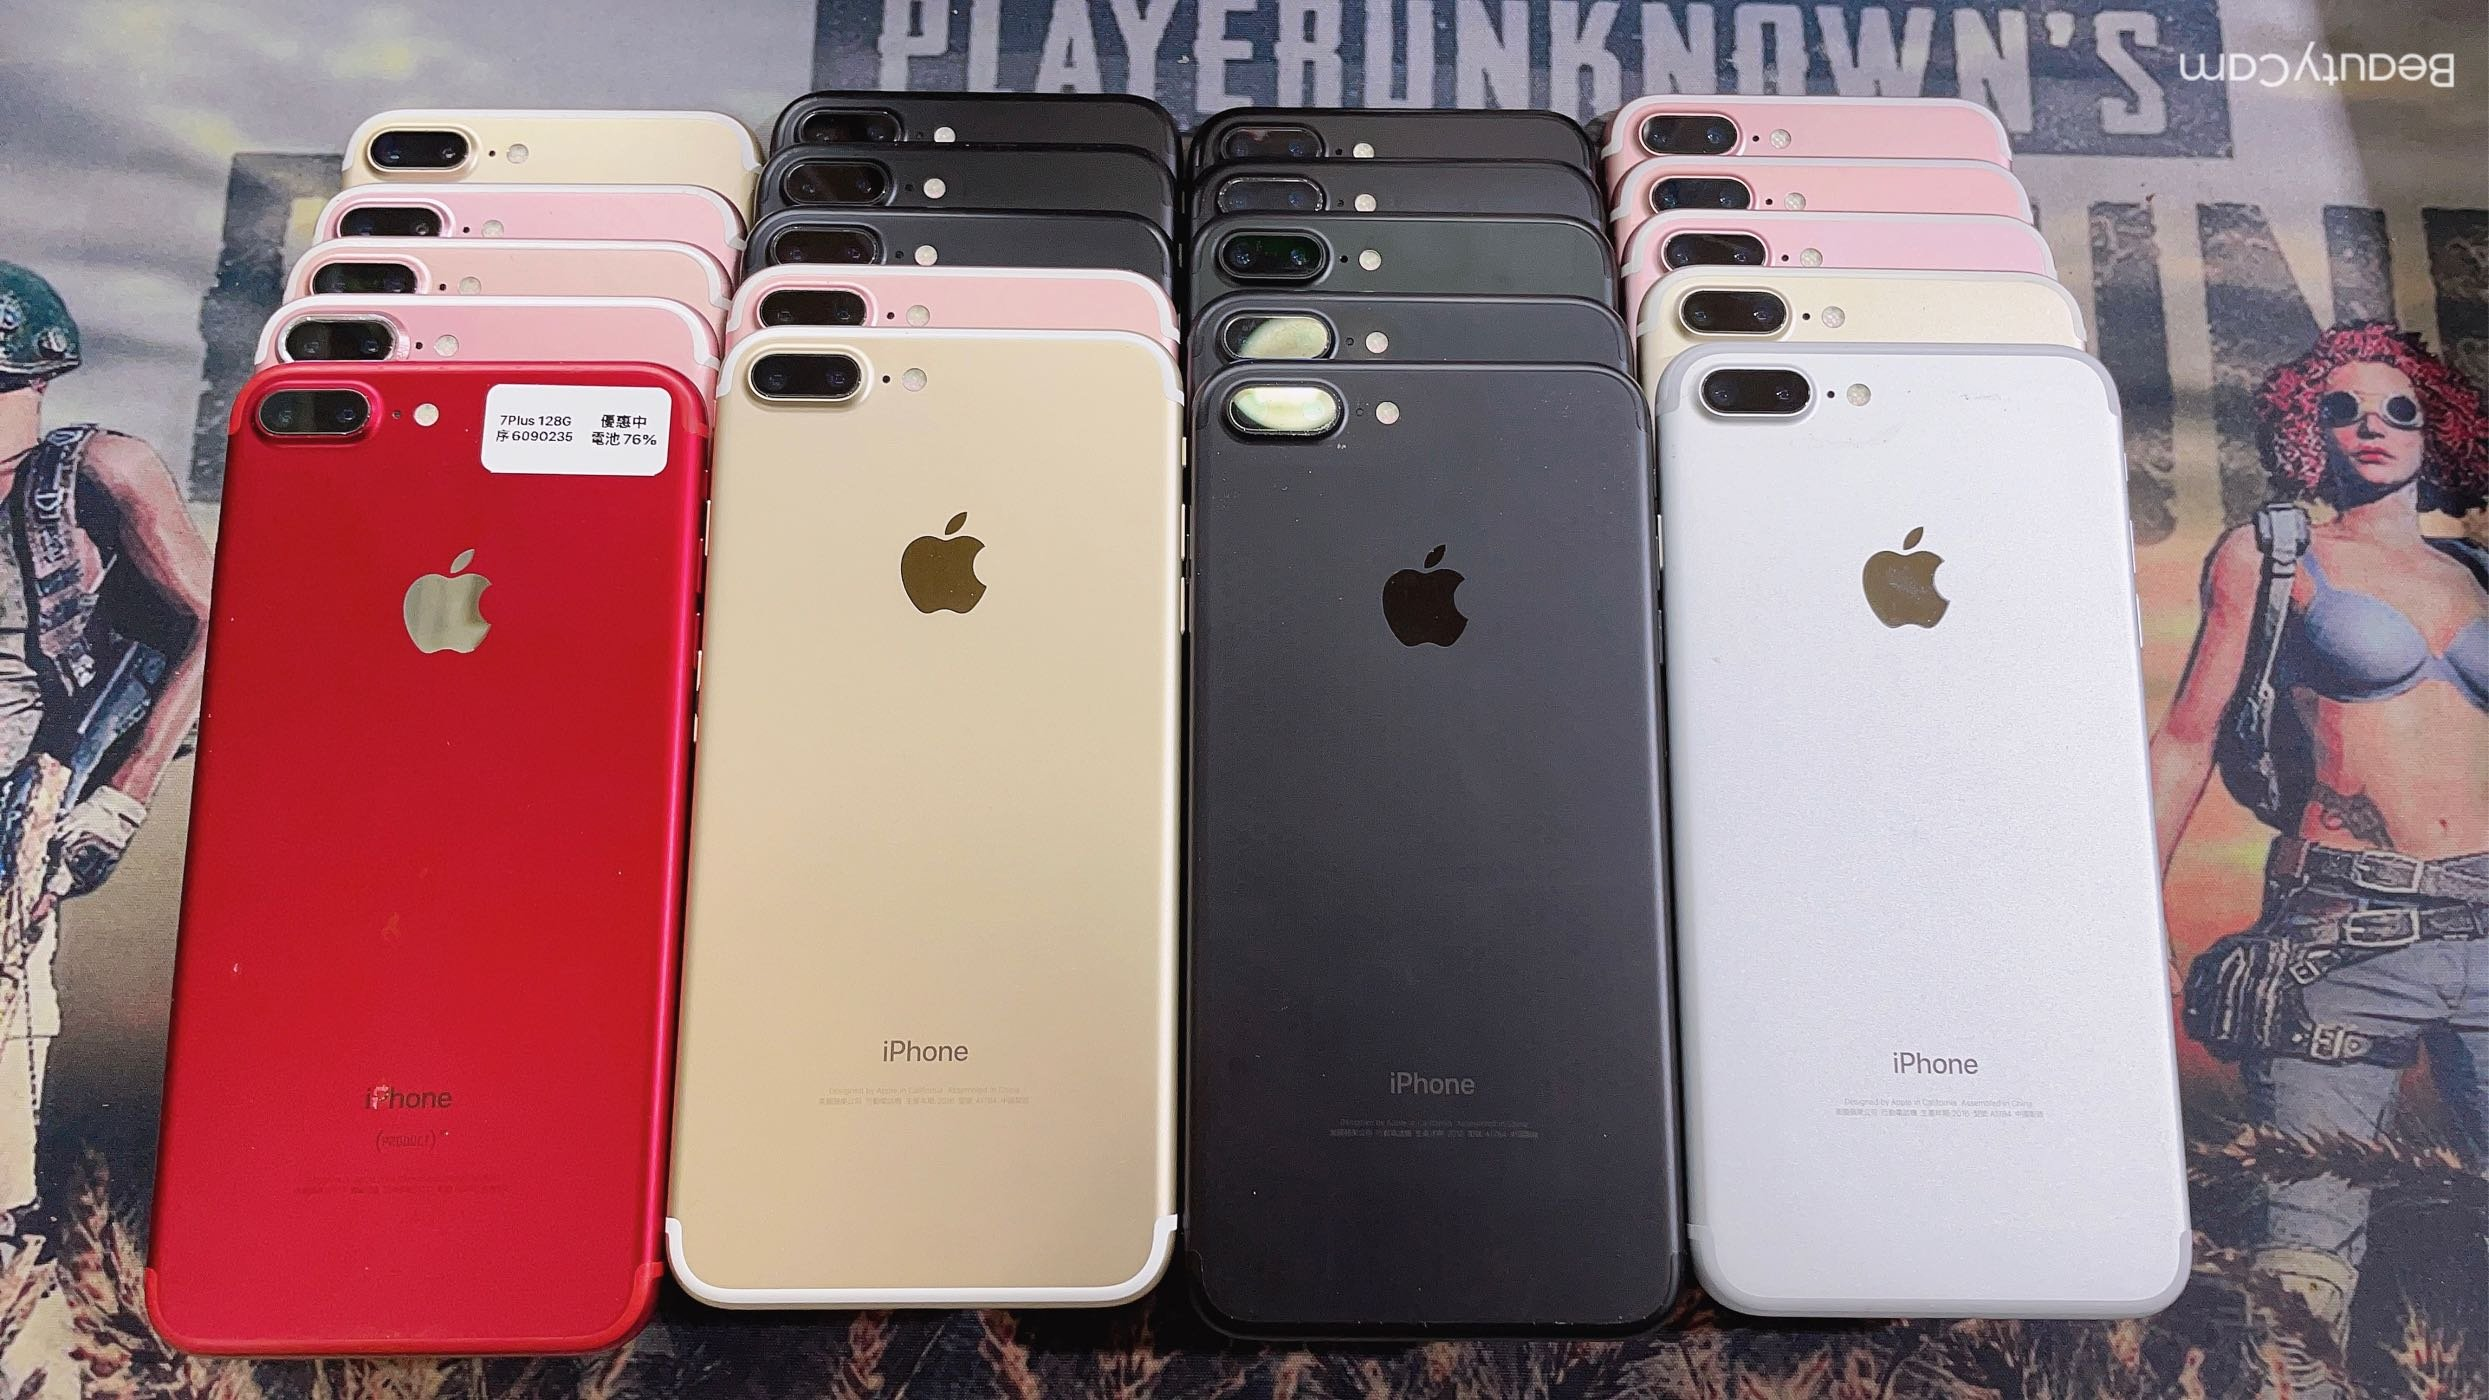 二手機 iPhone 7 plus 128g 另有 32g i8 64g 256g i7 6s 16 i6 64g